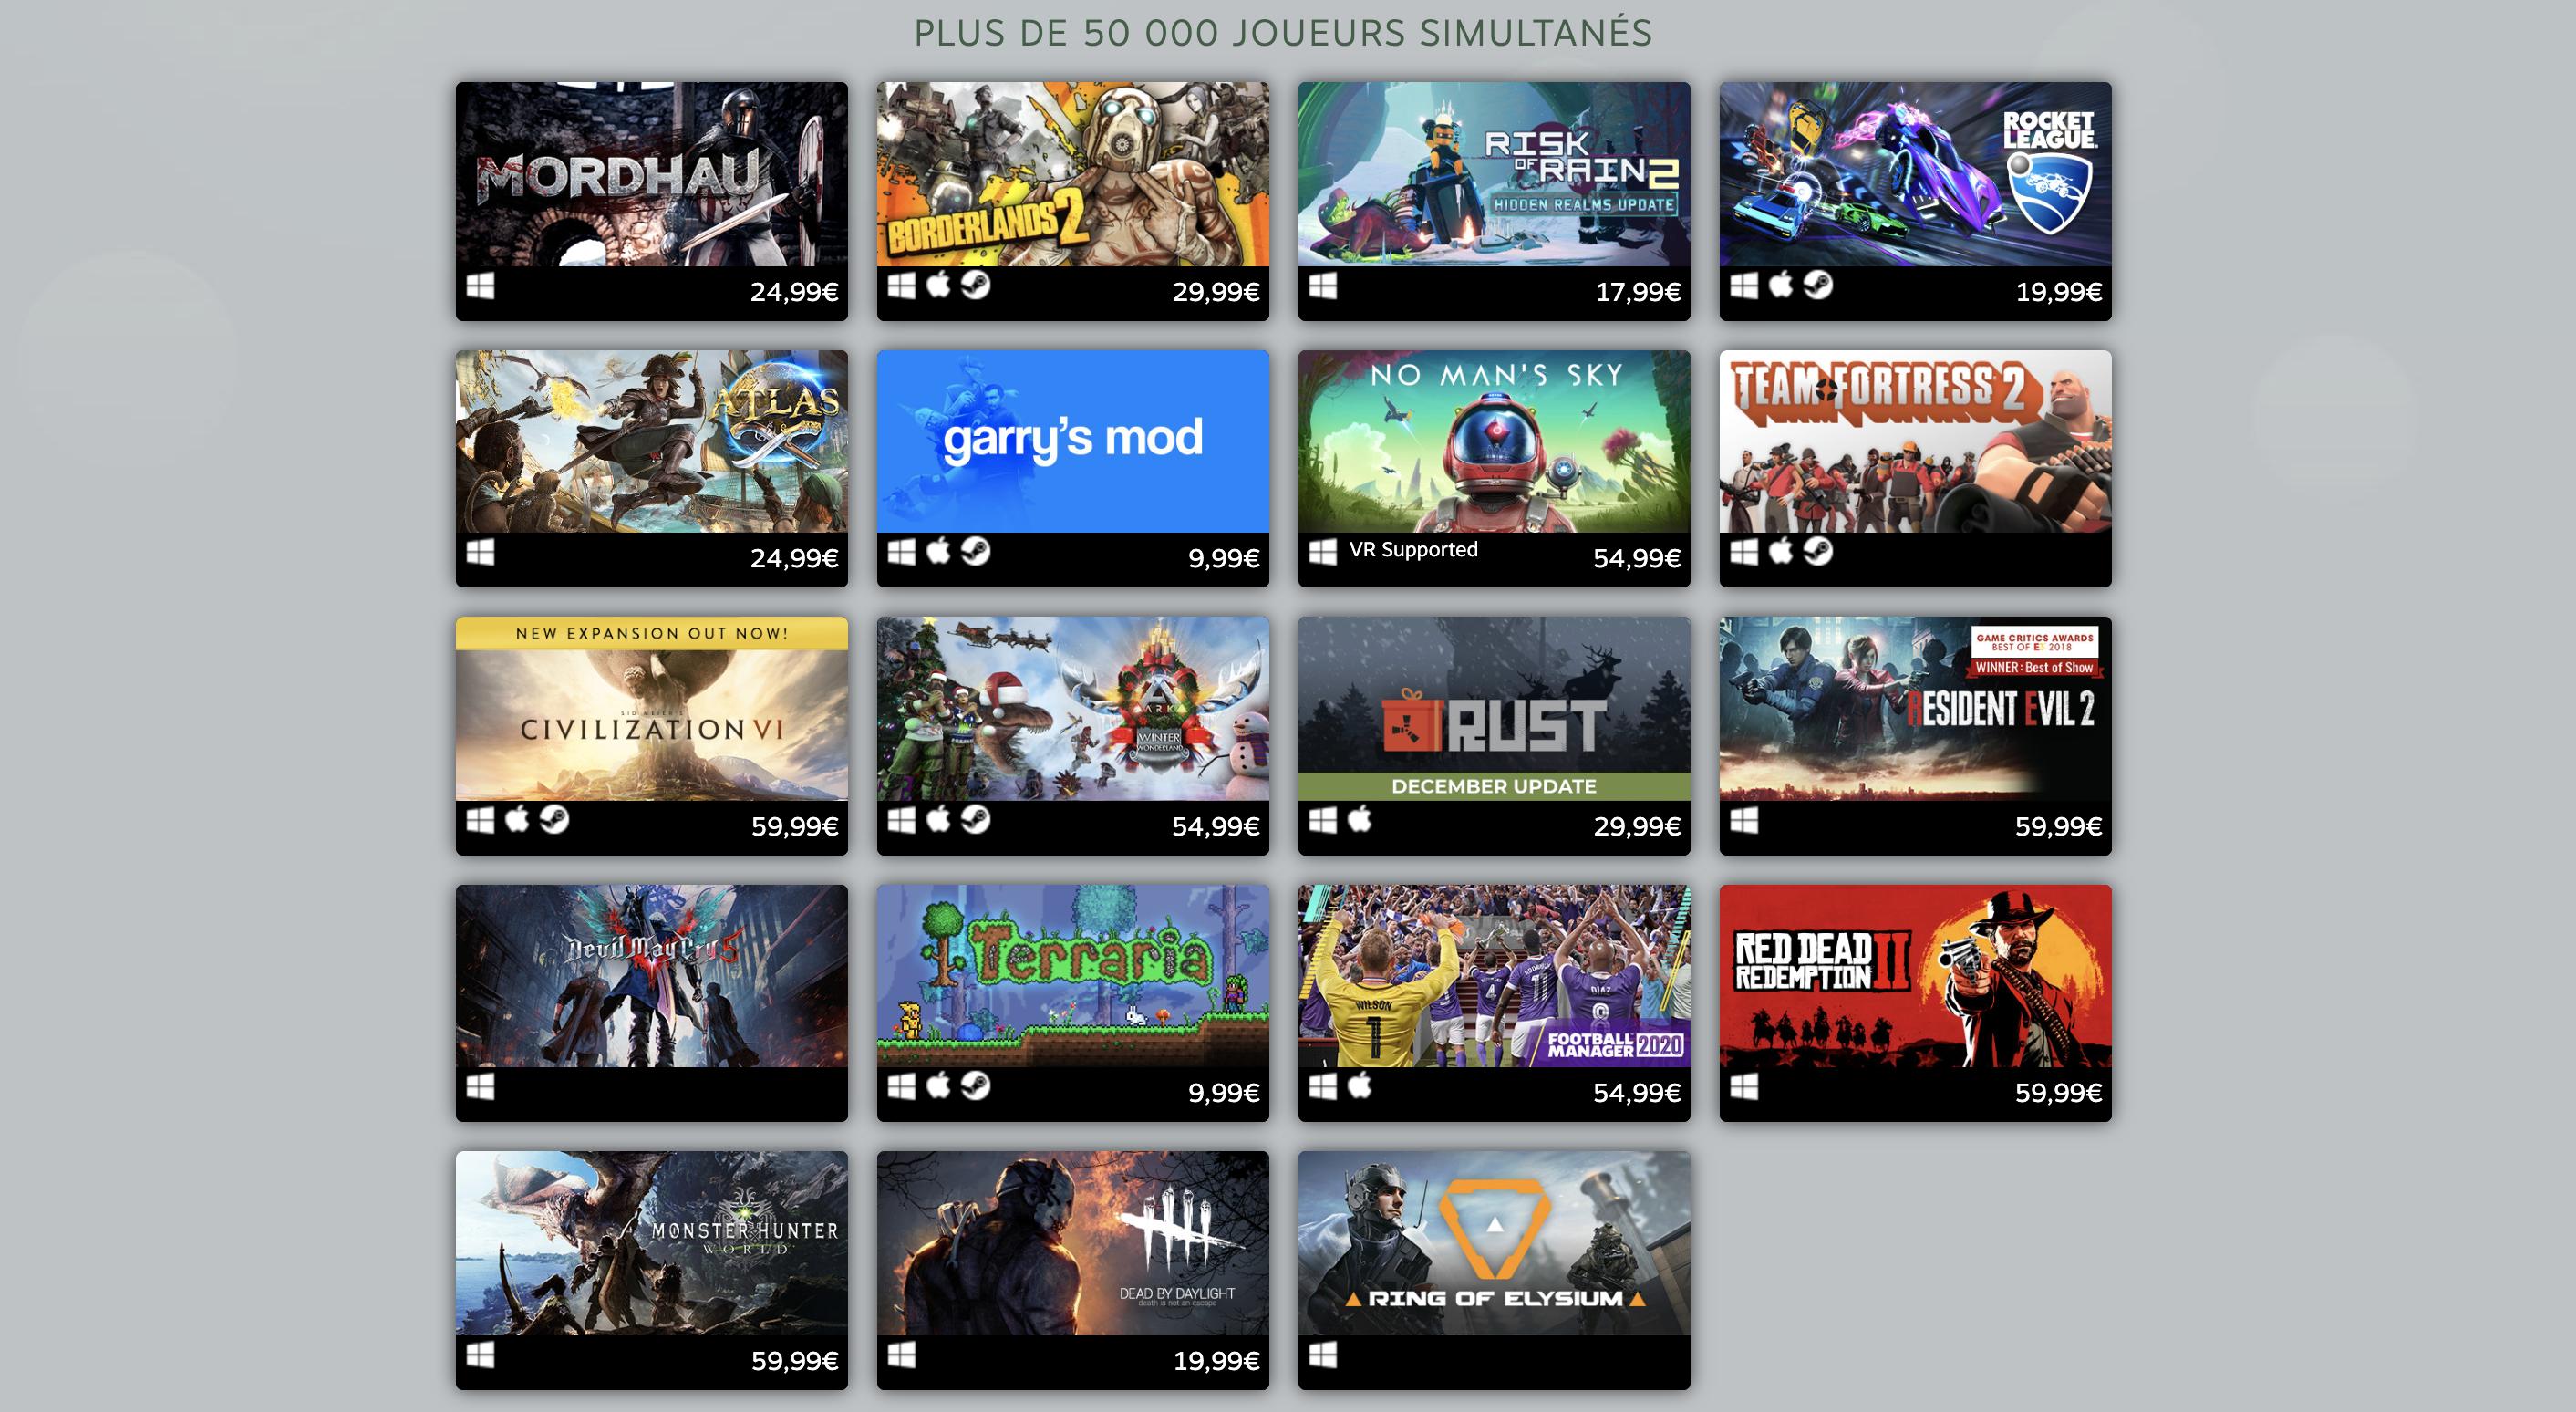 Top Jeux Steam Red Dead Redemption II 50000 joueurs